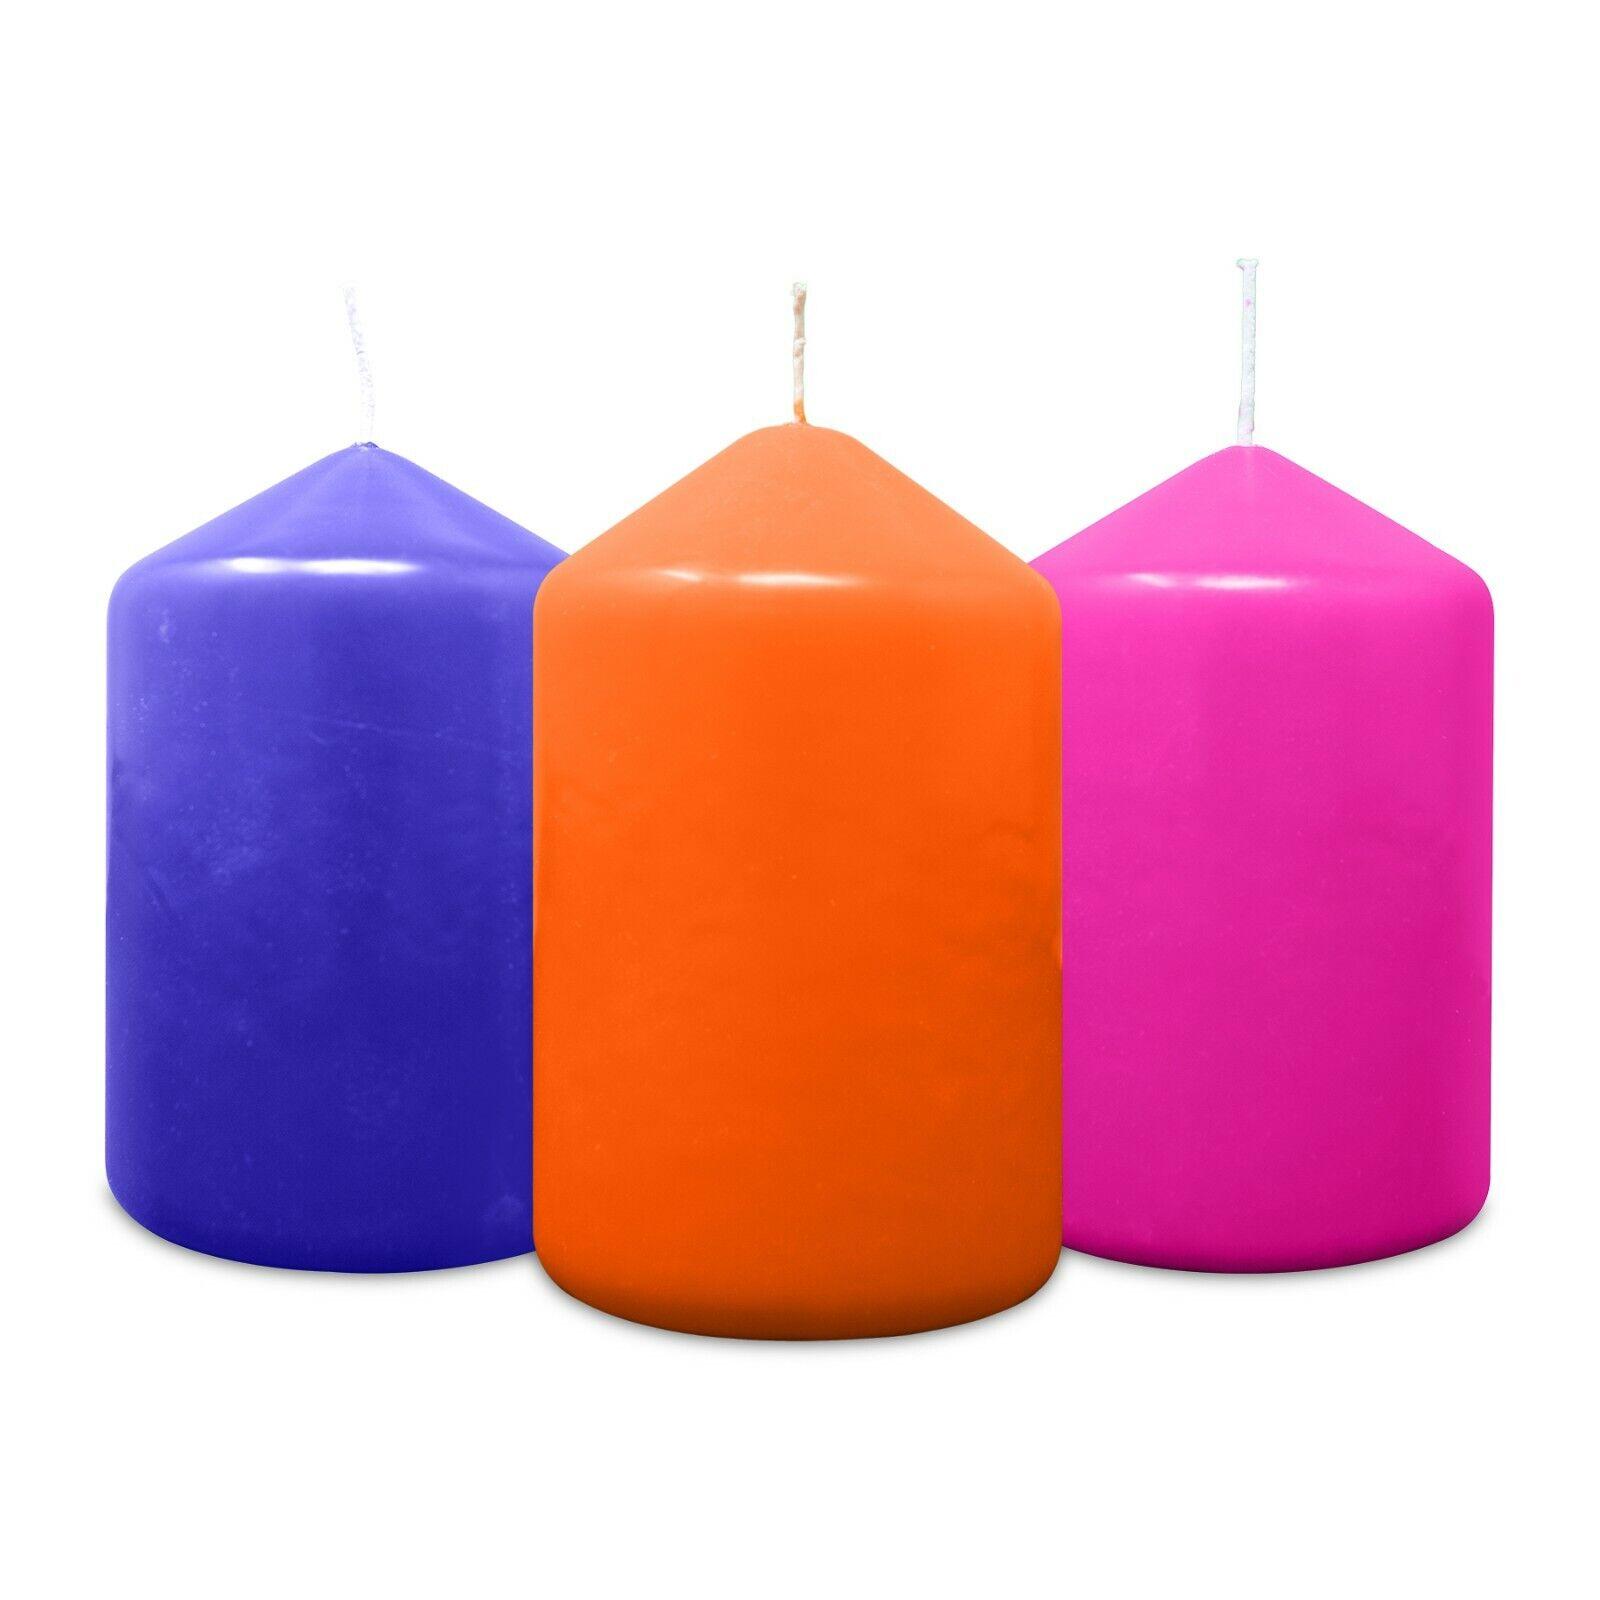 Kerzenfarbe Wachsfarbe in Pastillen, zum Durchfärben, Kerzen, Made in Germany